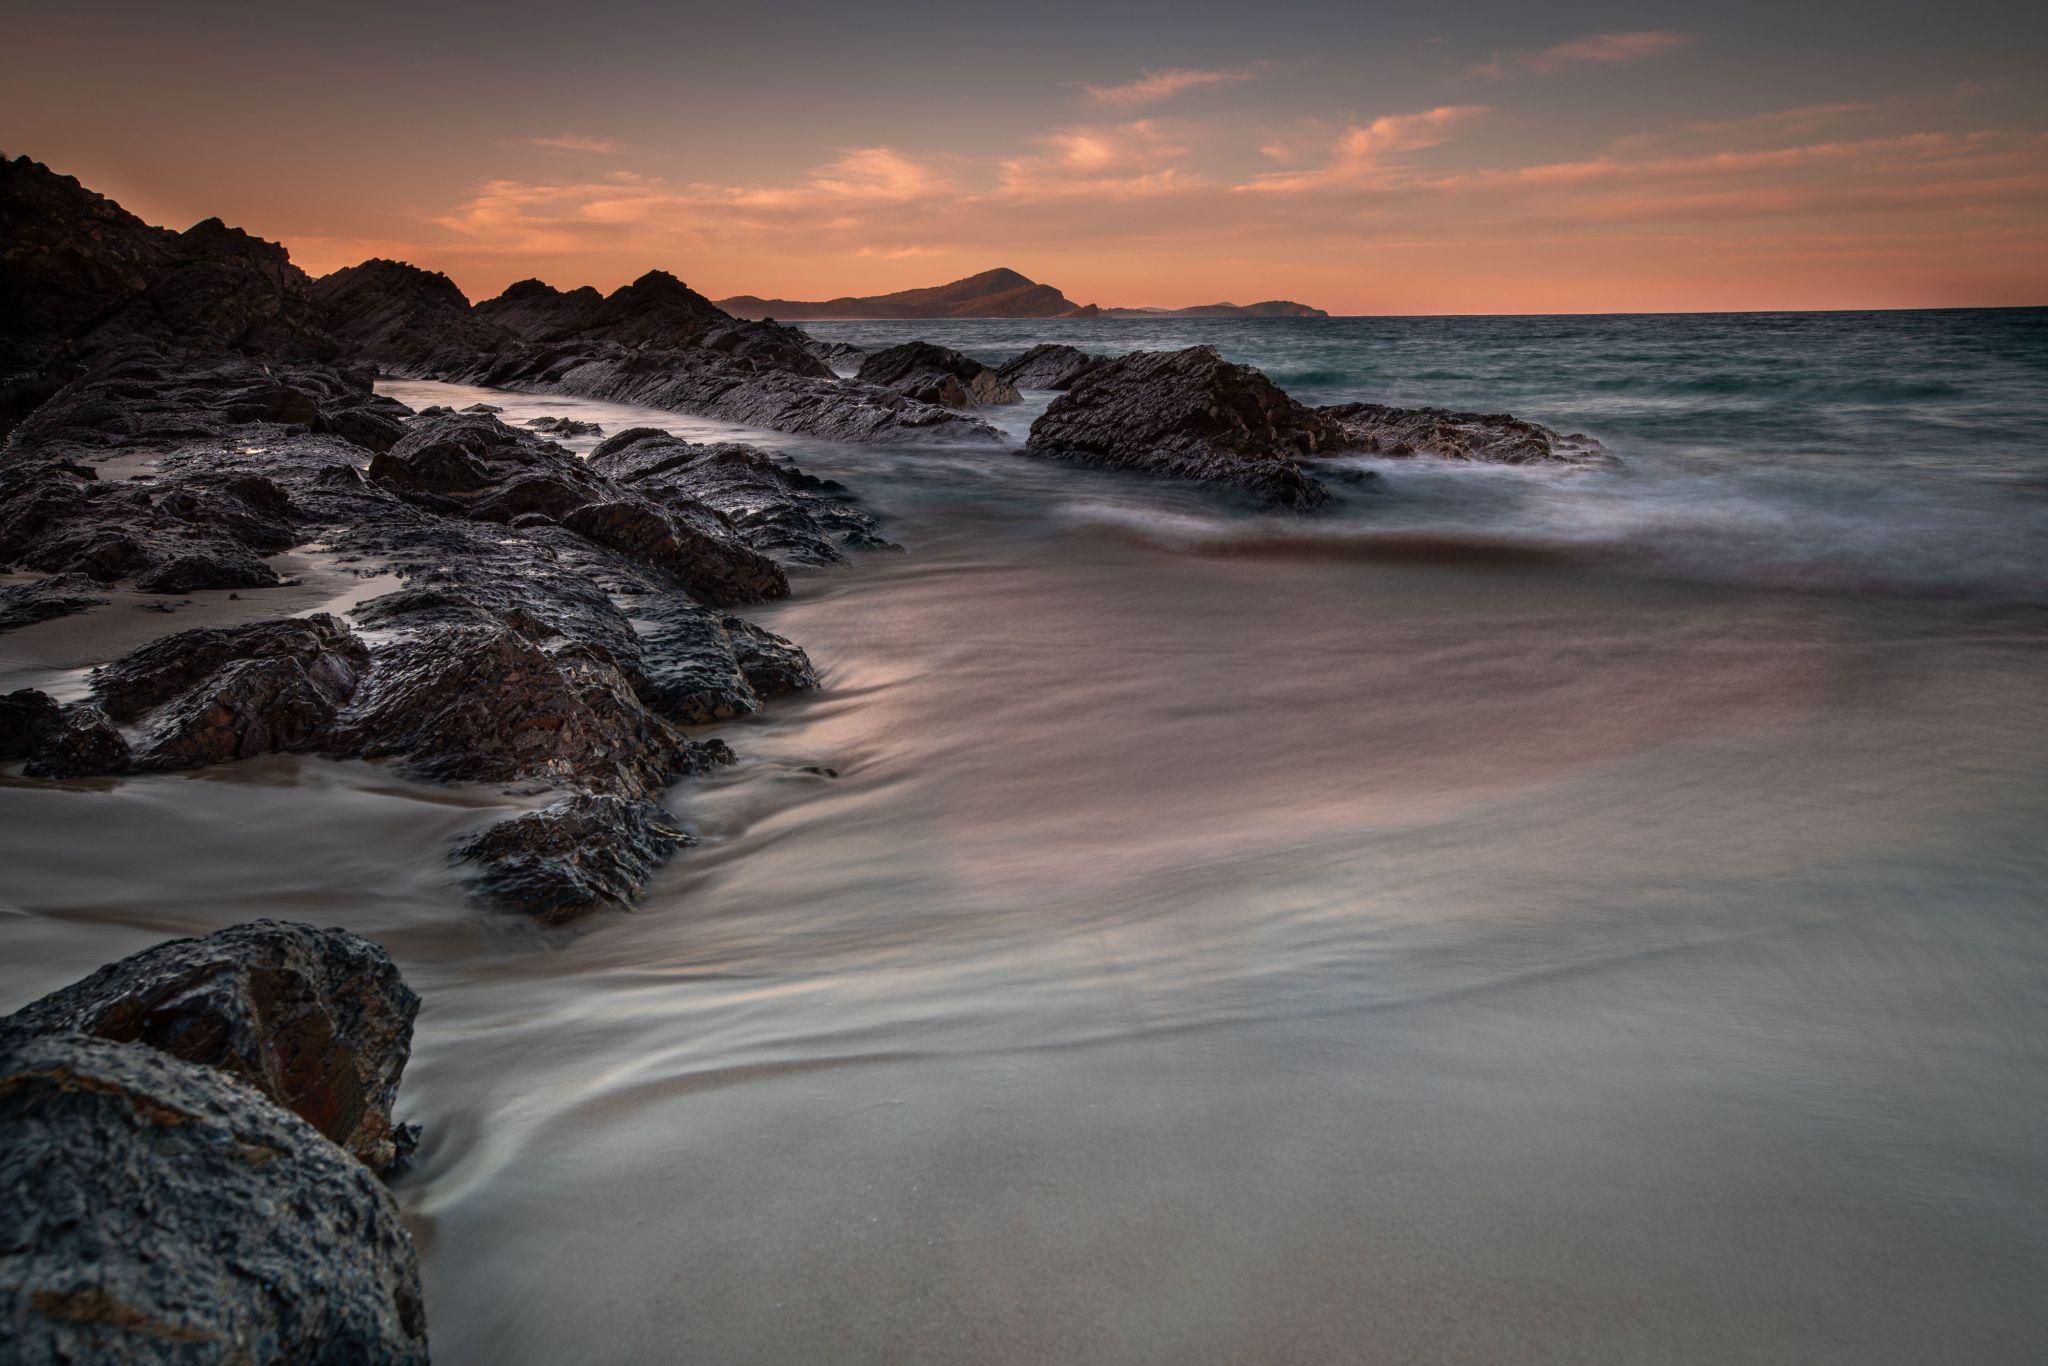 Boat Beach sunrise Seal Rocks New South Wales, Australia